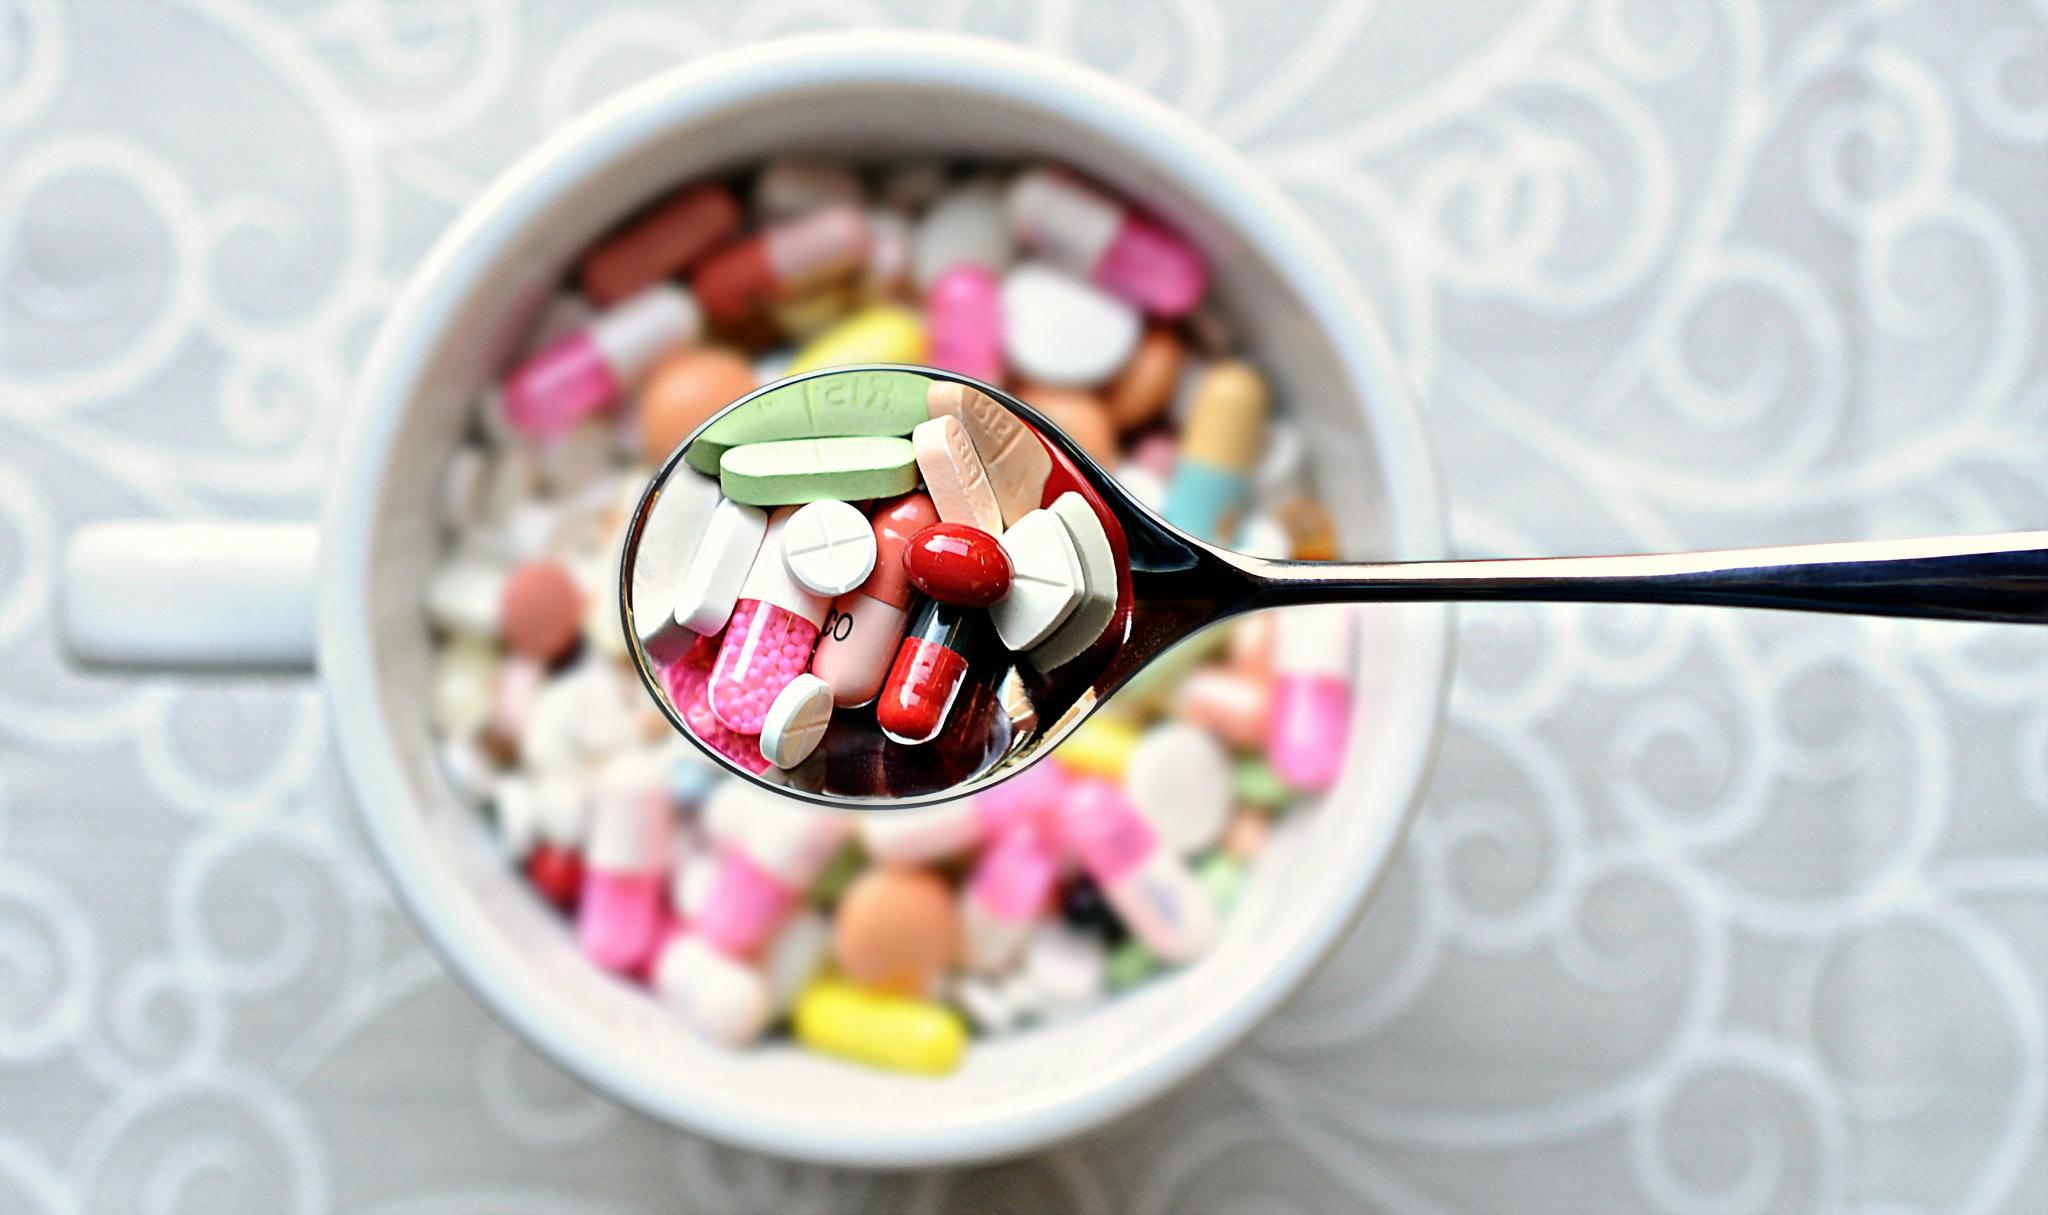 Как принимать лекарства? Lozhka-lekarstva-fon